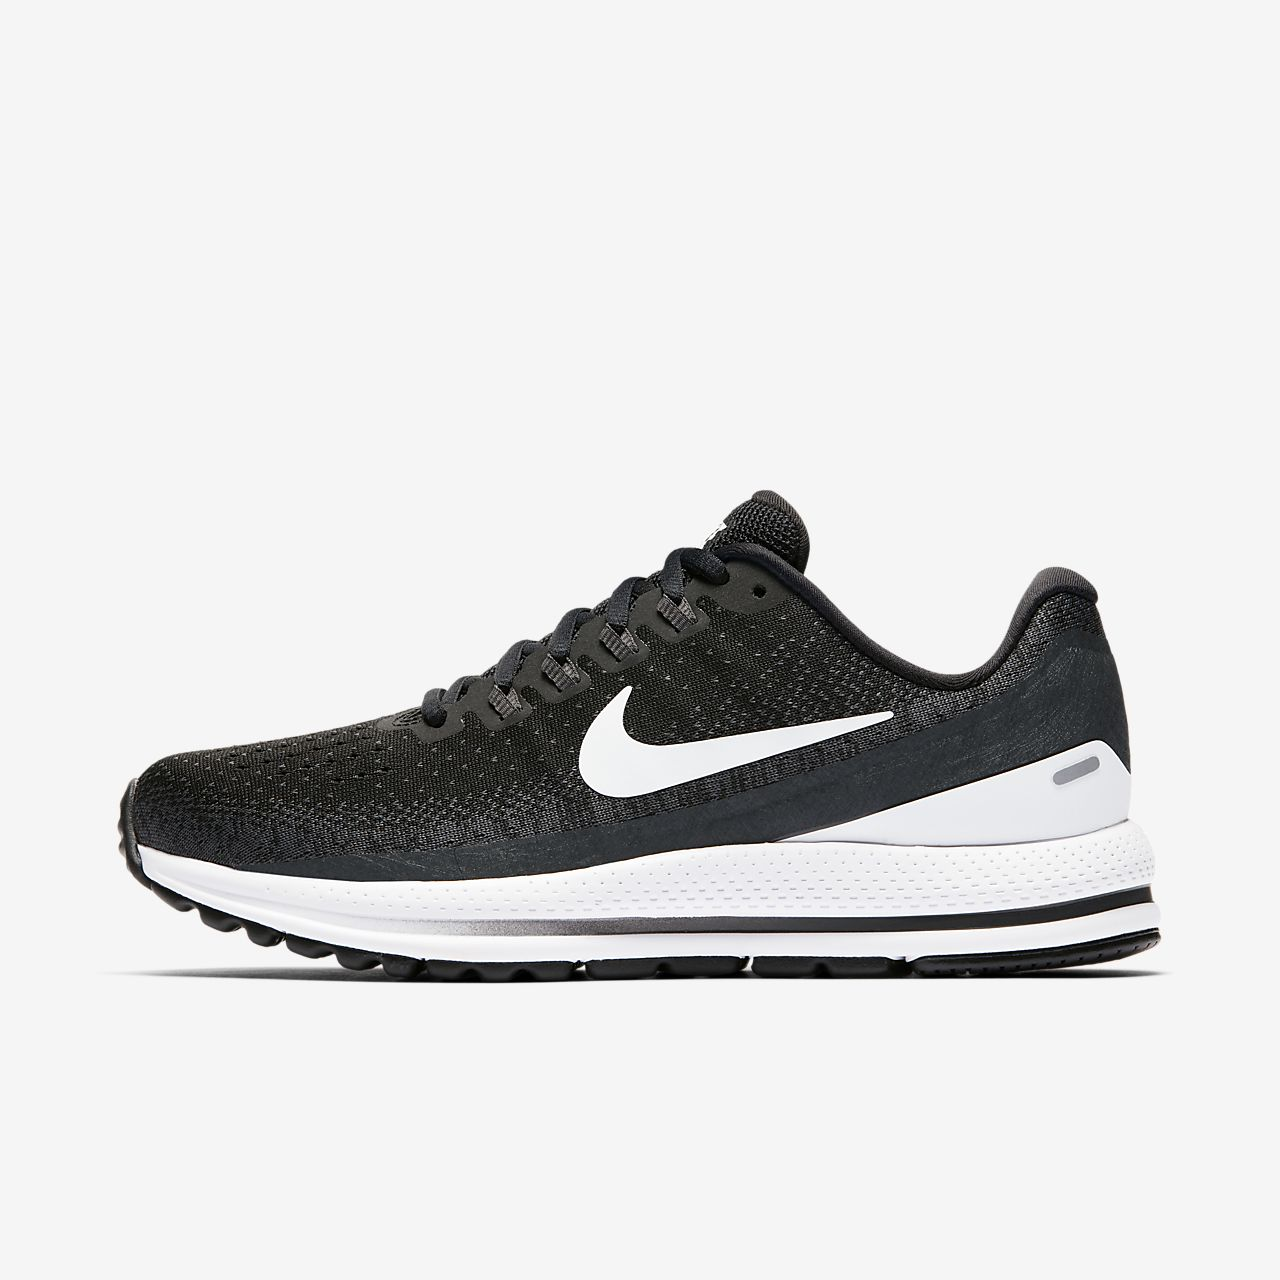 8d7ad76526ffe Scarpa da running Nike Air Zoom Vomero 13 - Donna. Nike.com CH